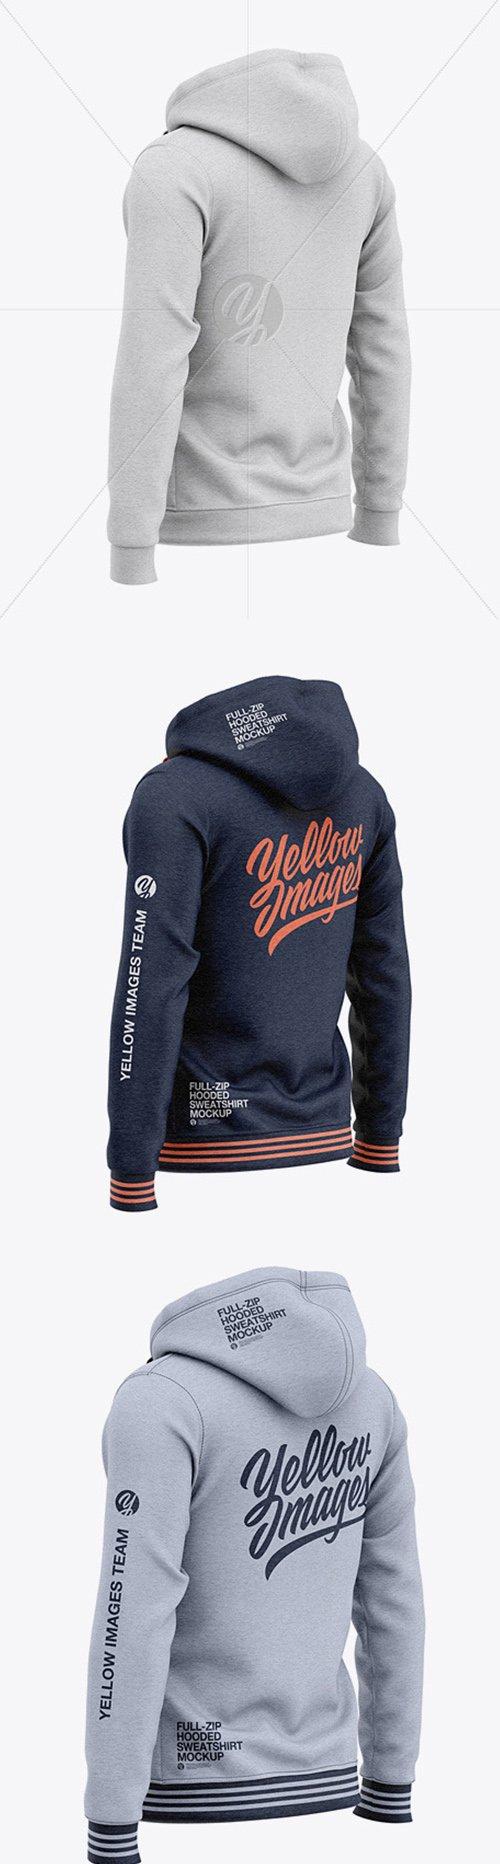 Full-Zip Heather Hooded Sweatshirt - Back Half Side View 48953